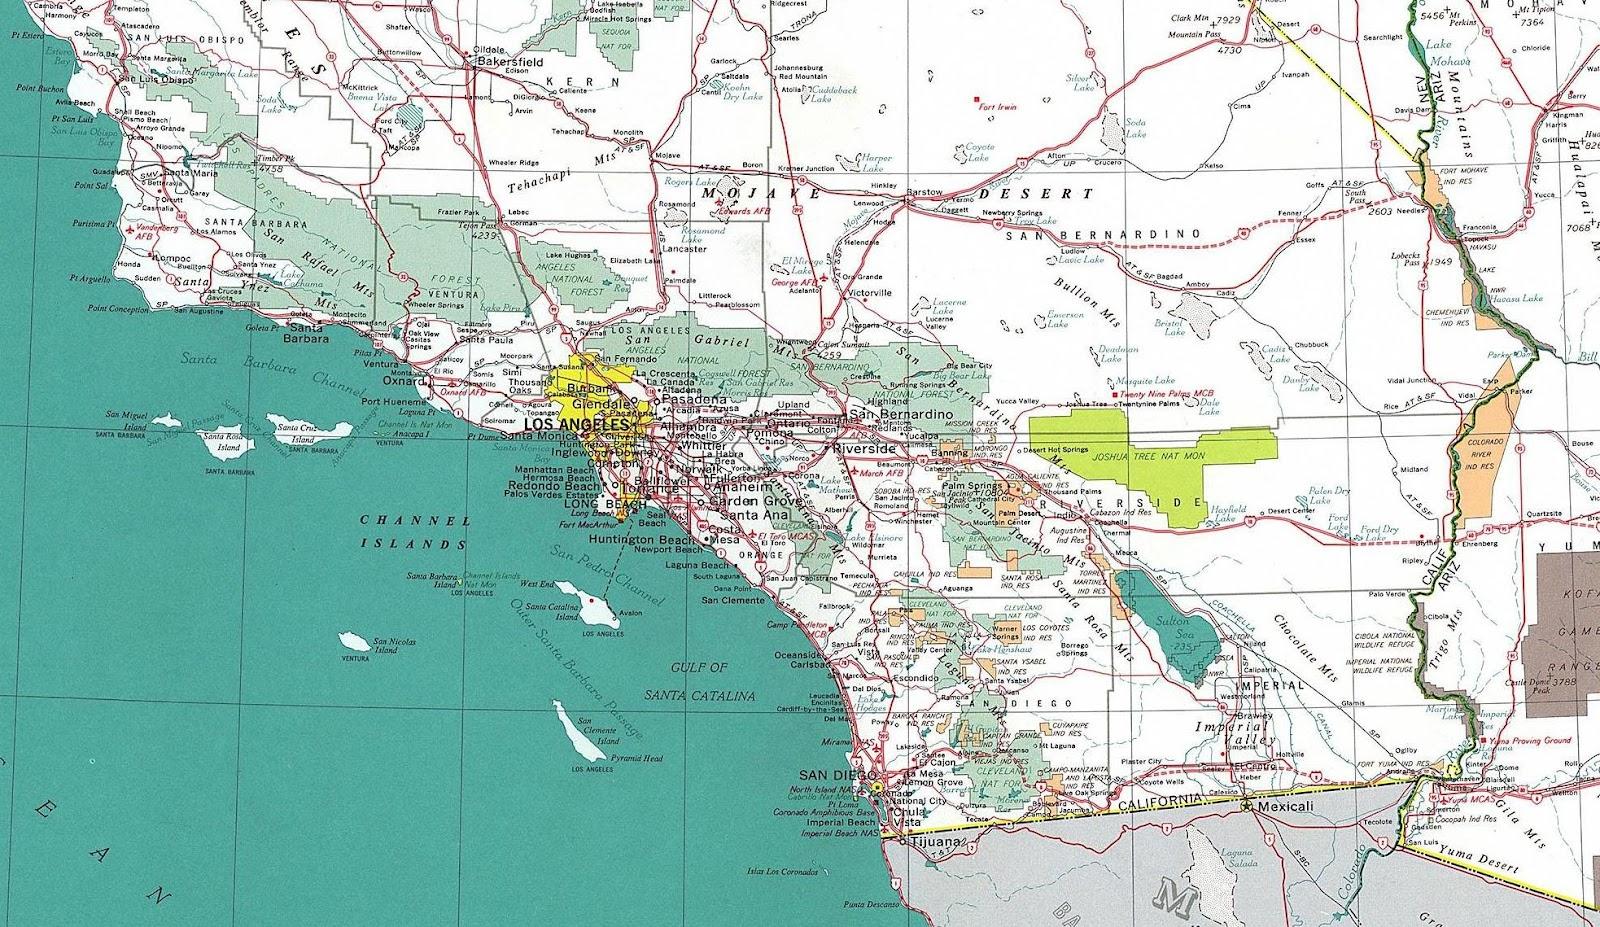 Southern California Road Map California River Map Highway Map - Detailed Map Of Southern California